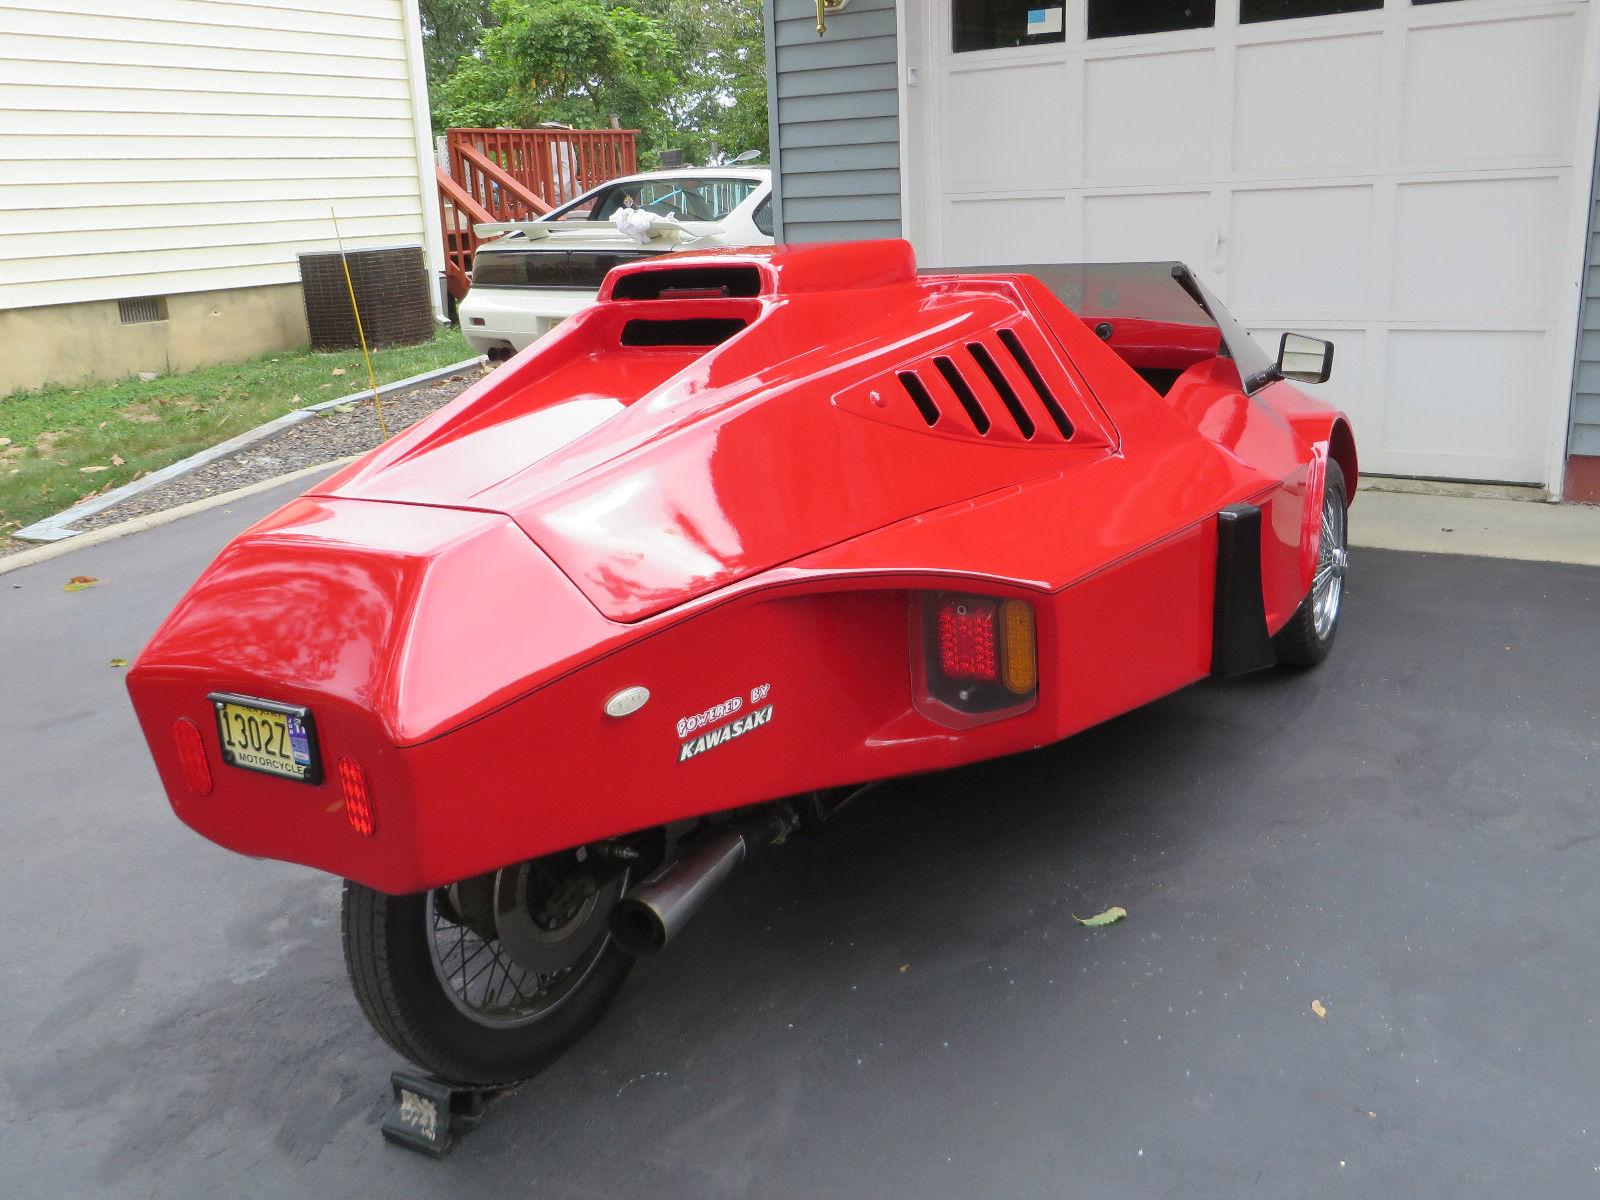 Yamaha R1 For Sale Cheap 1972 Honda CB 750 Four in addition Kawasaki Mule 2510 For Sale besides ...